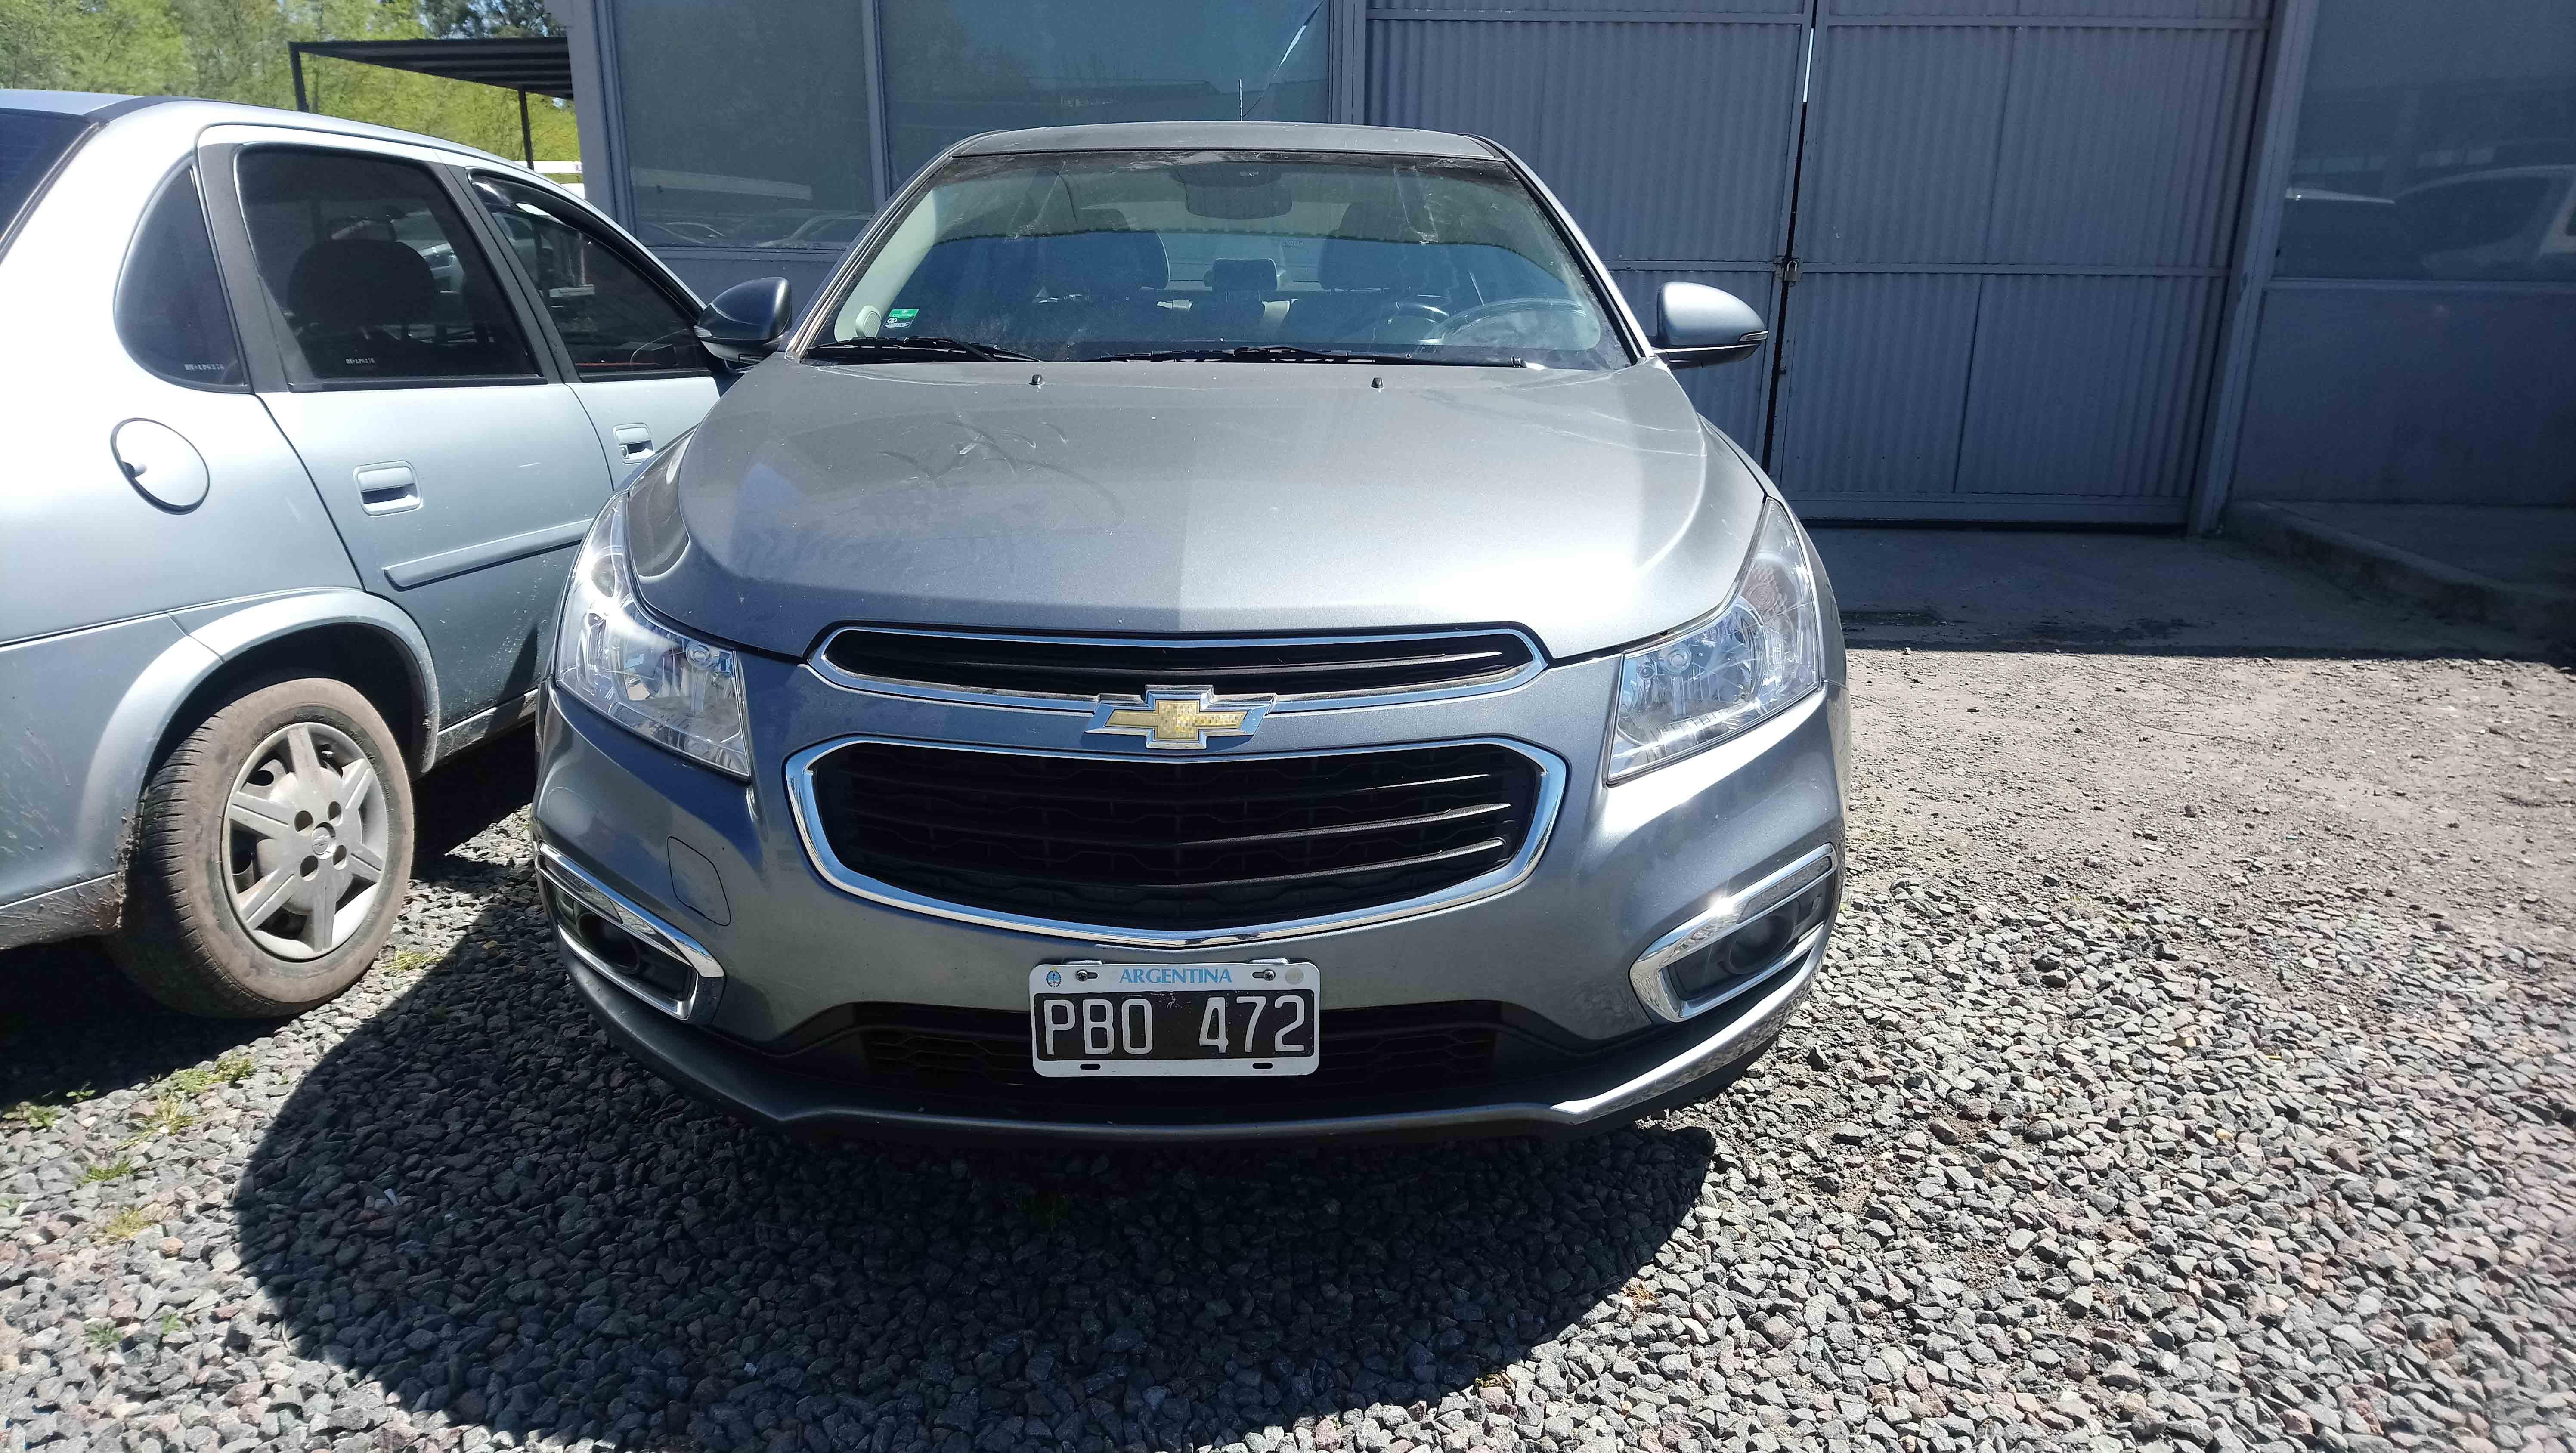 2015 Chevrolet Cruze 1.8 4 Ptas LTZ 1.8L